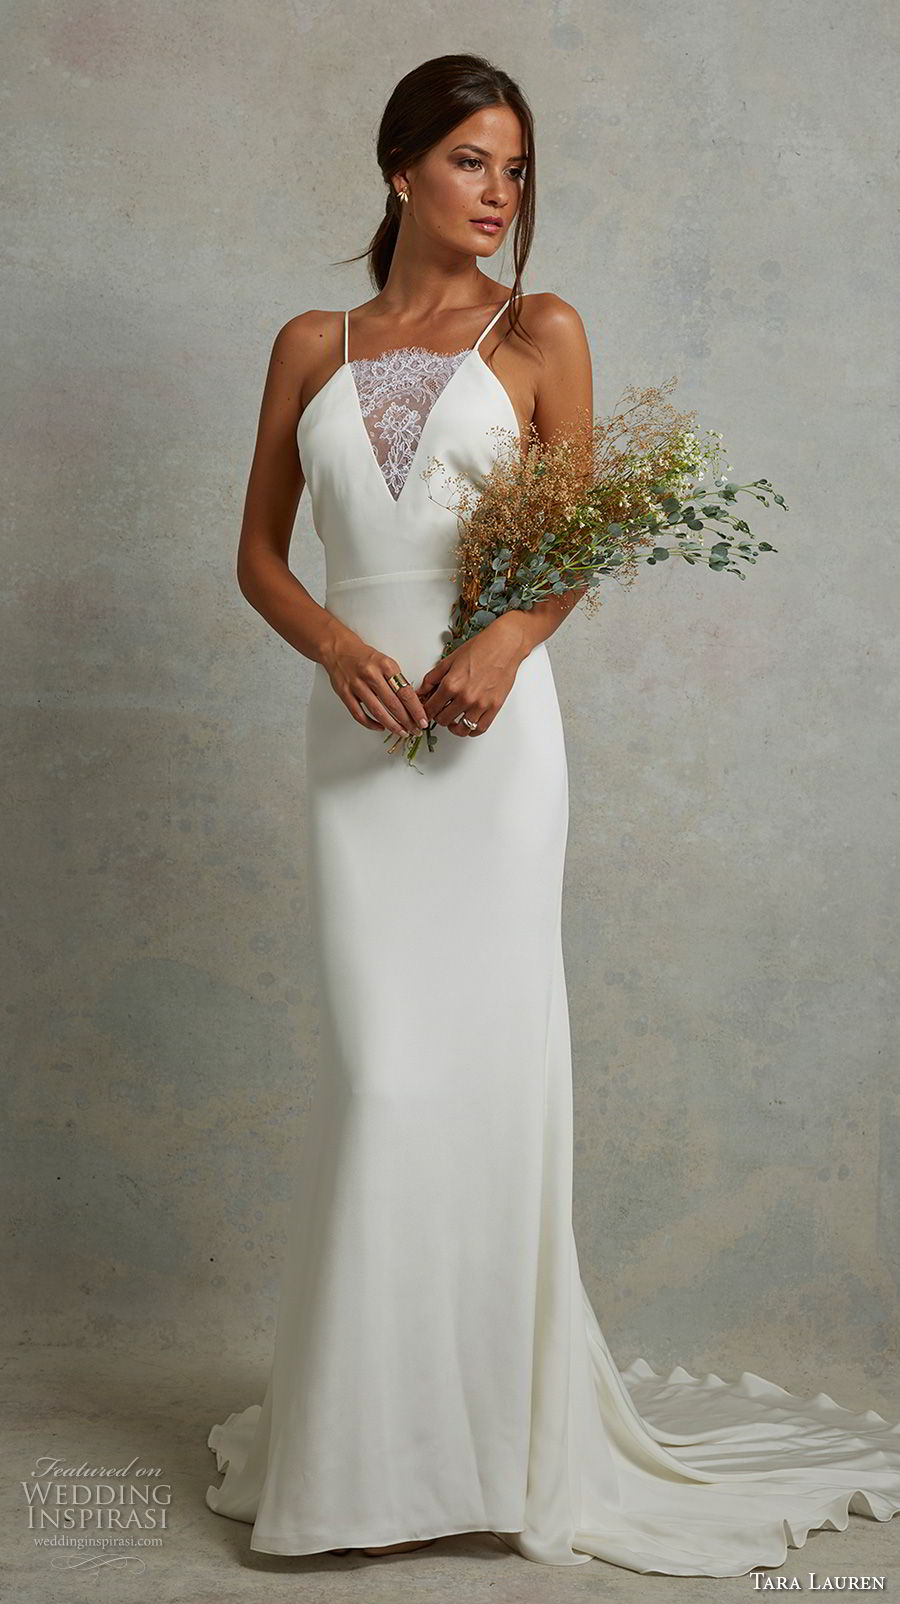 tara lauren spring 2018 bridal sleeveless spaghetti strap illusion v neck simple clean elegant sheath wedding dress open back sweep train (3) mv